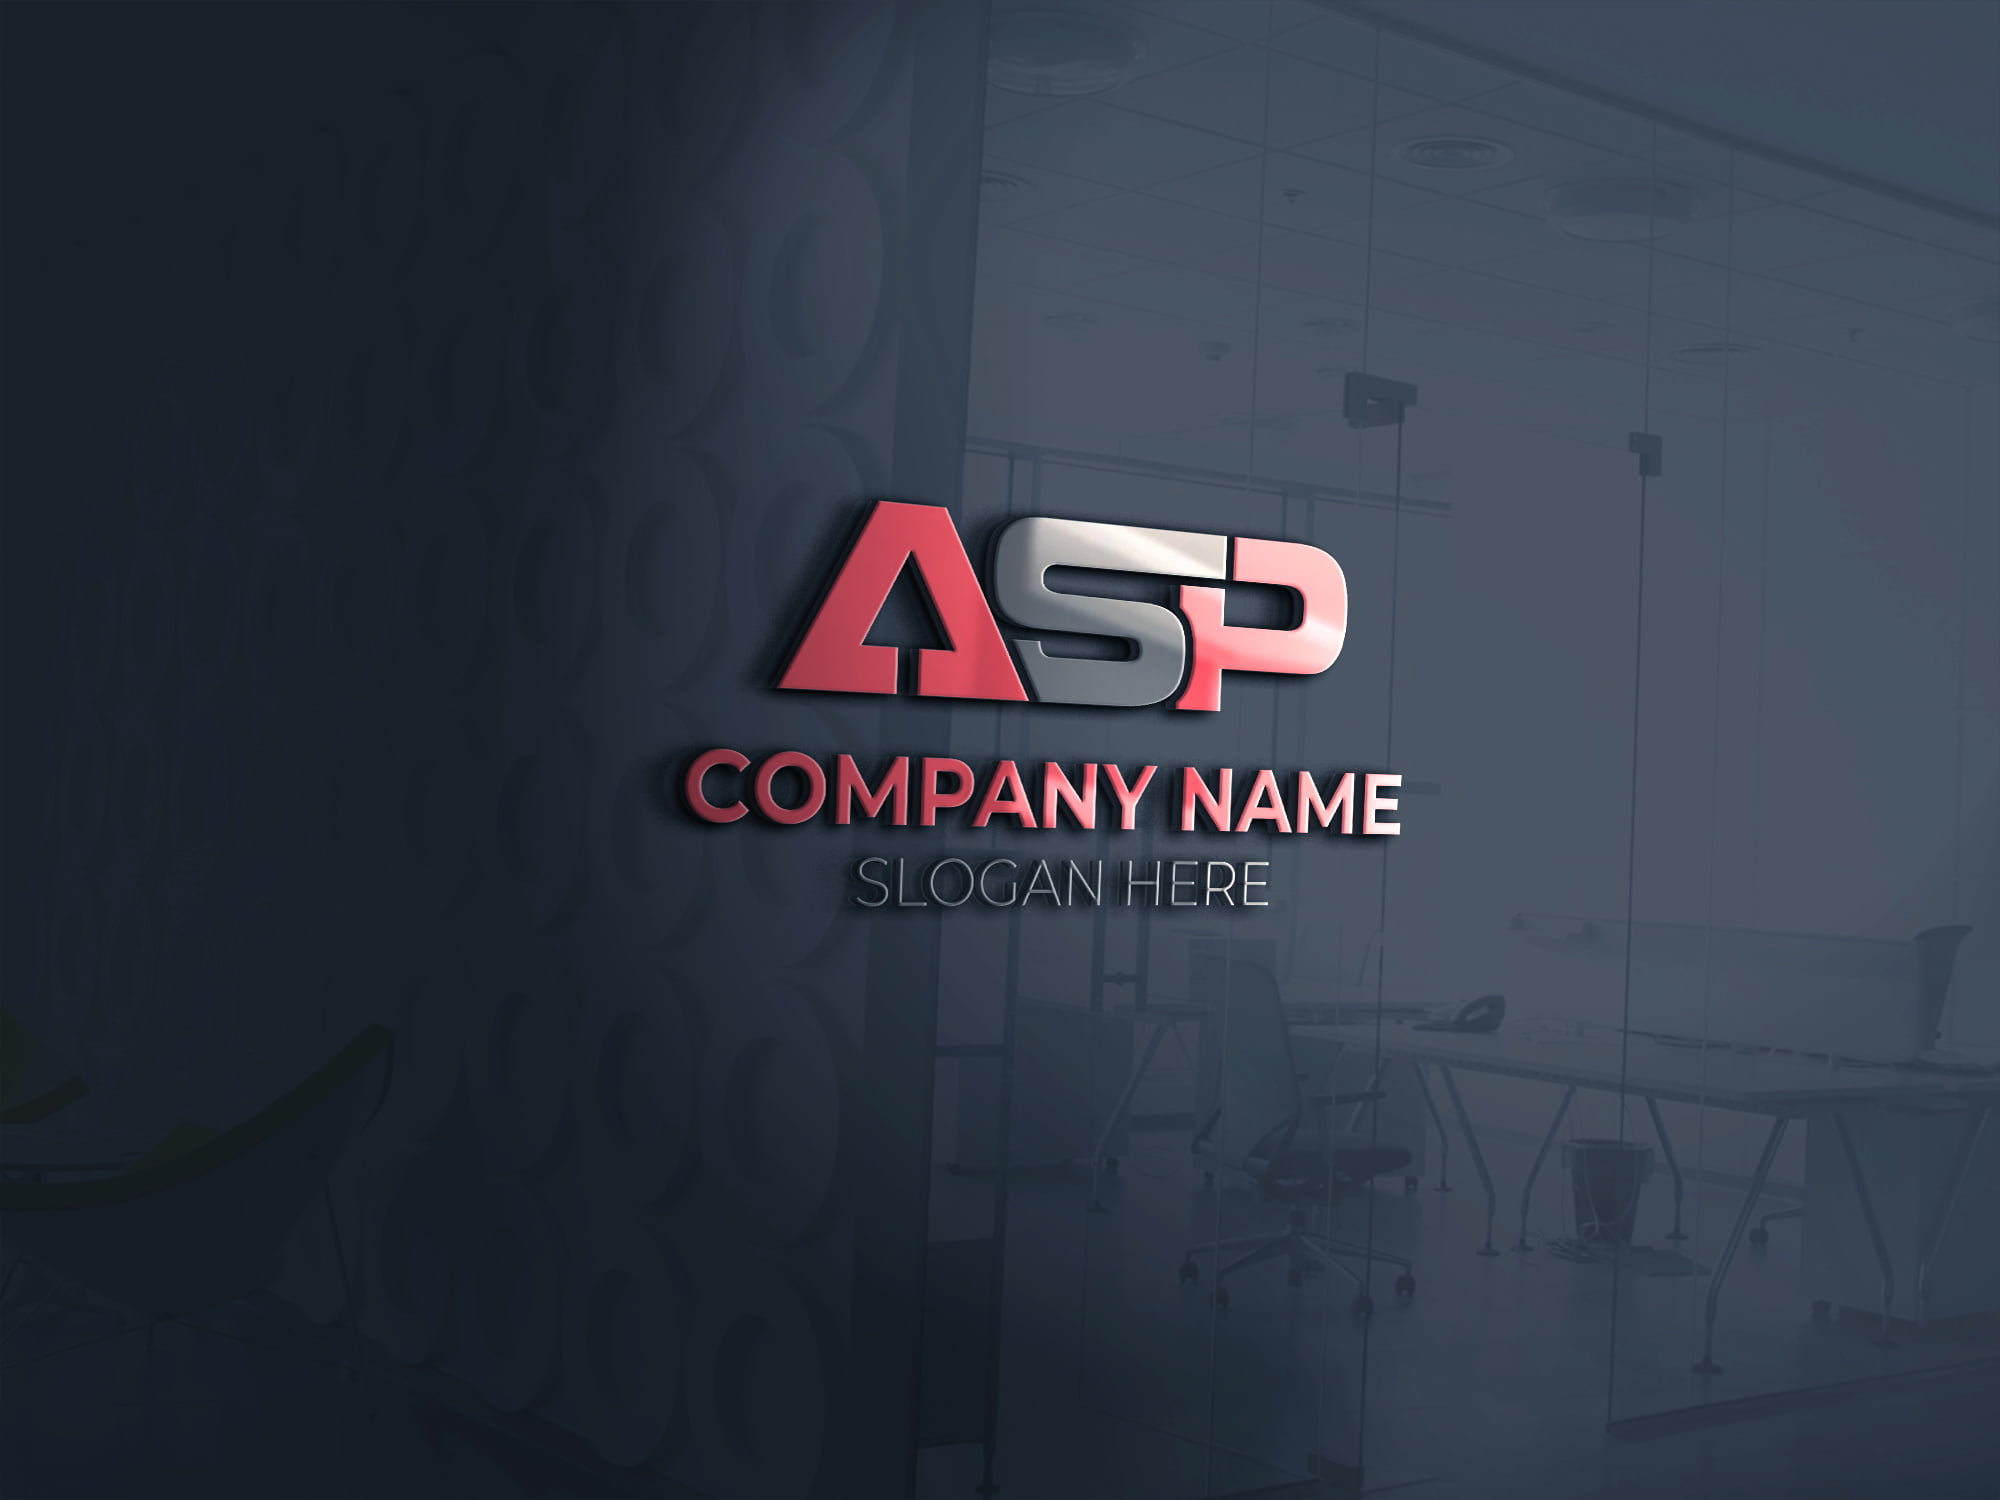 3D ASP LETTER MONOGRAM FOR FINANCE COMPANY